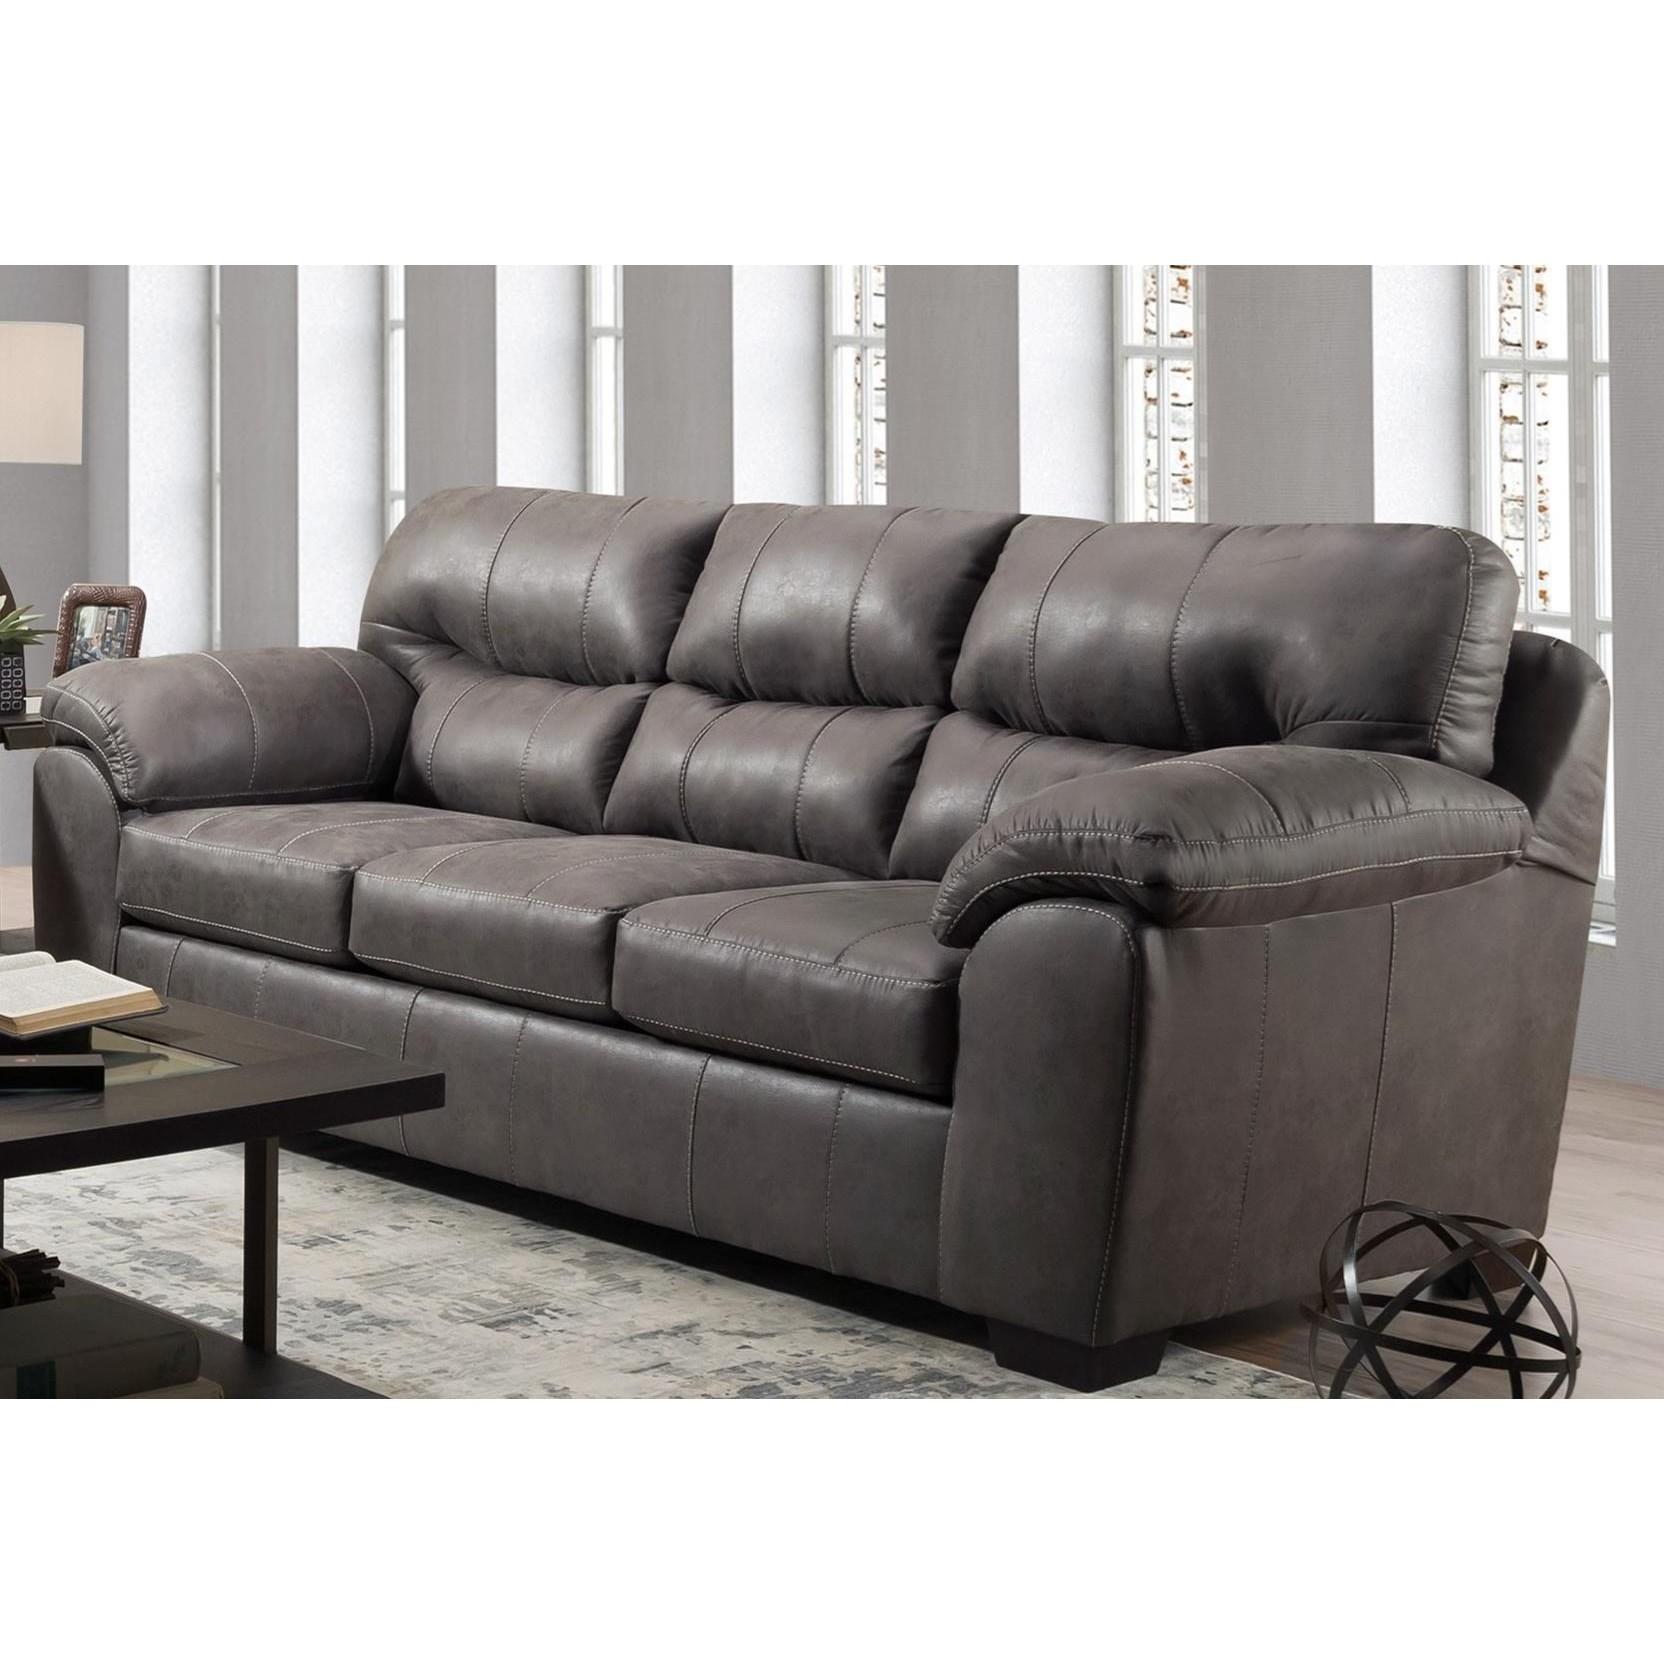 1780 Sofa by Peak Living at Steger's Furniture